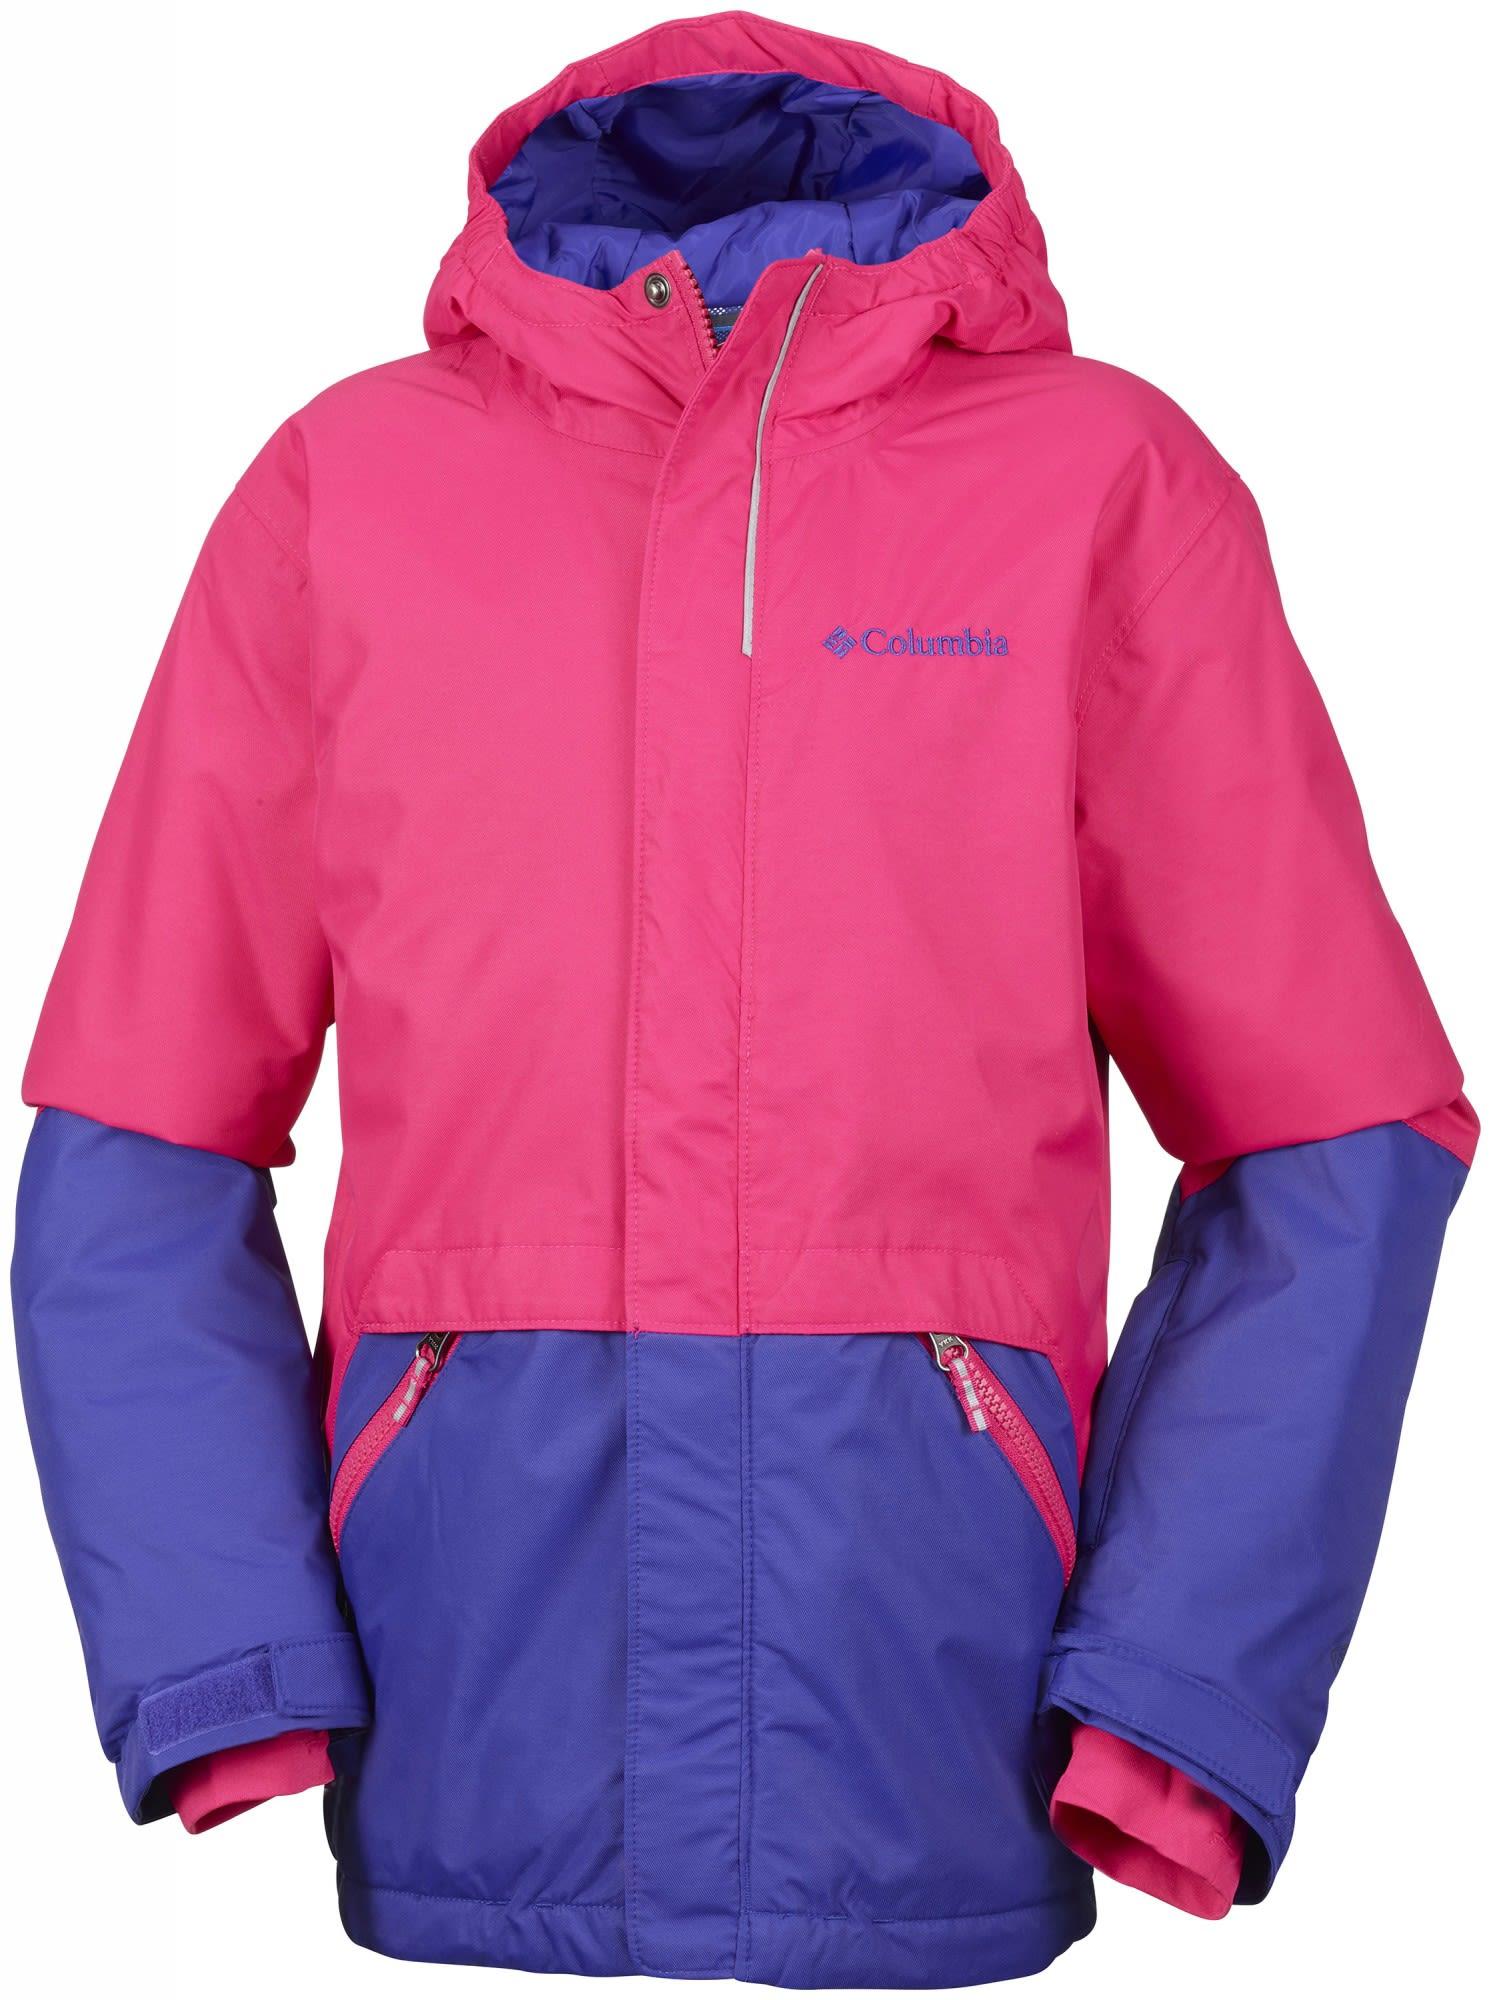 Columbia Girls Slope Star Jacket Blau, Female Freizeitjacke, S